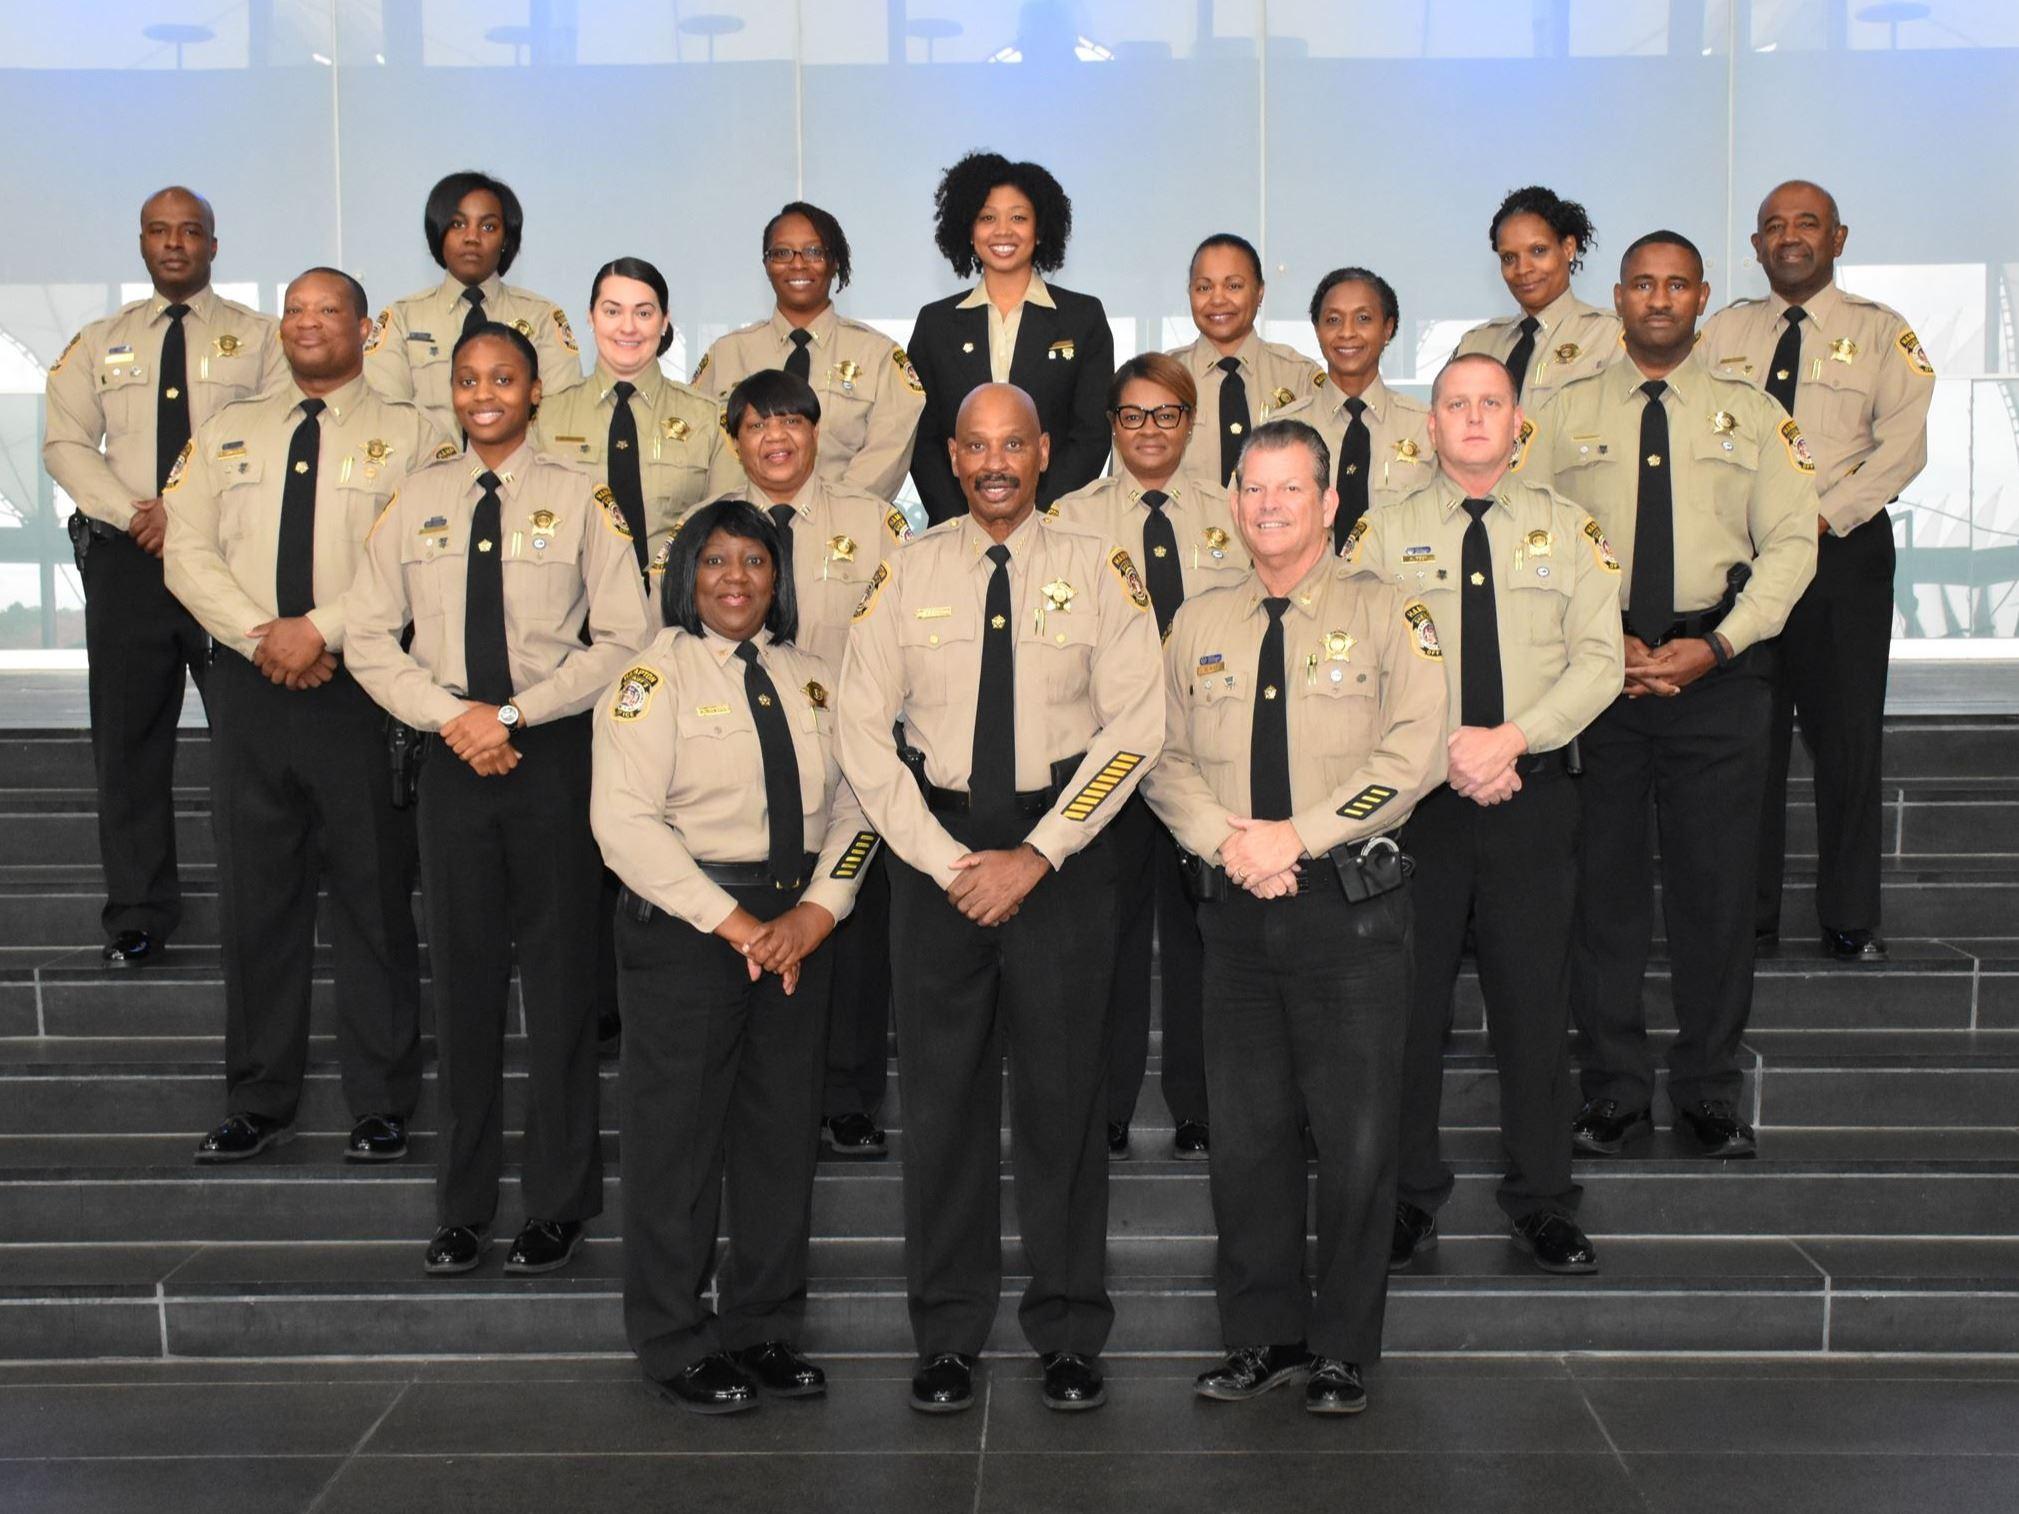 Sheriff's Office | Hampton, VA - Official Website